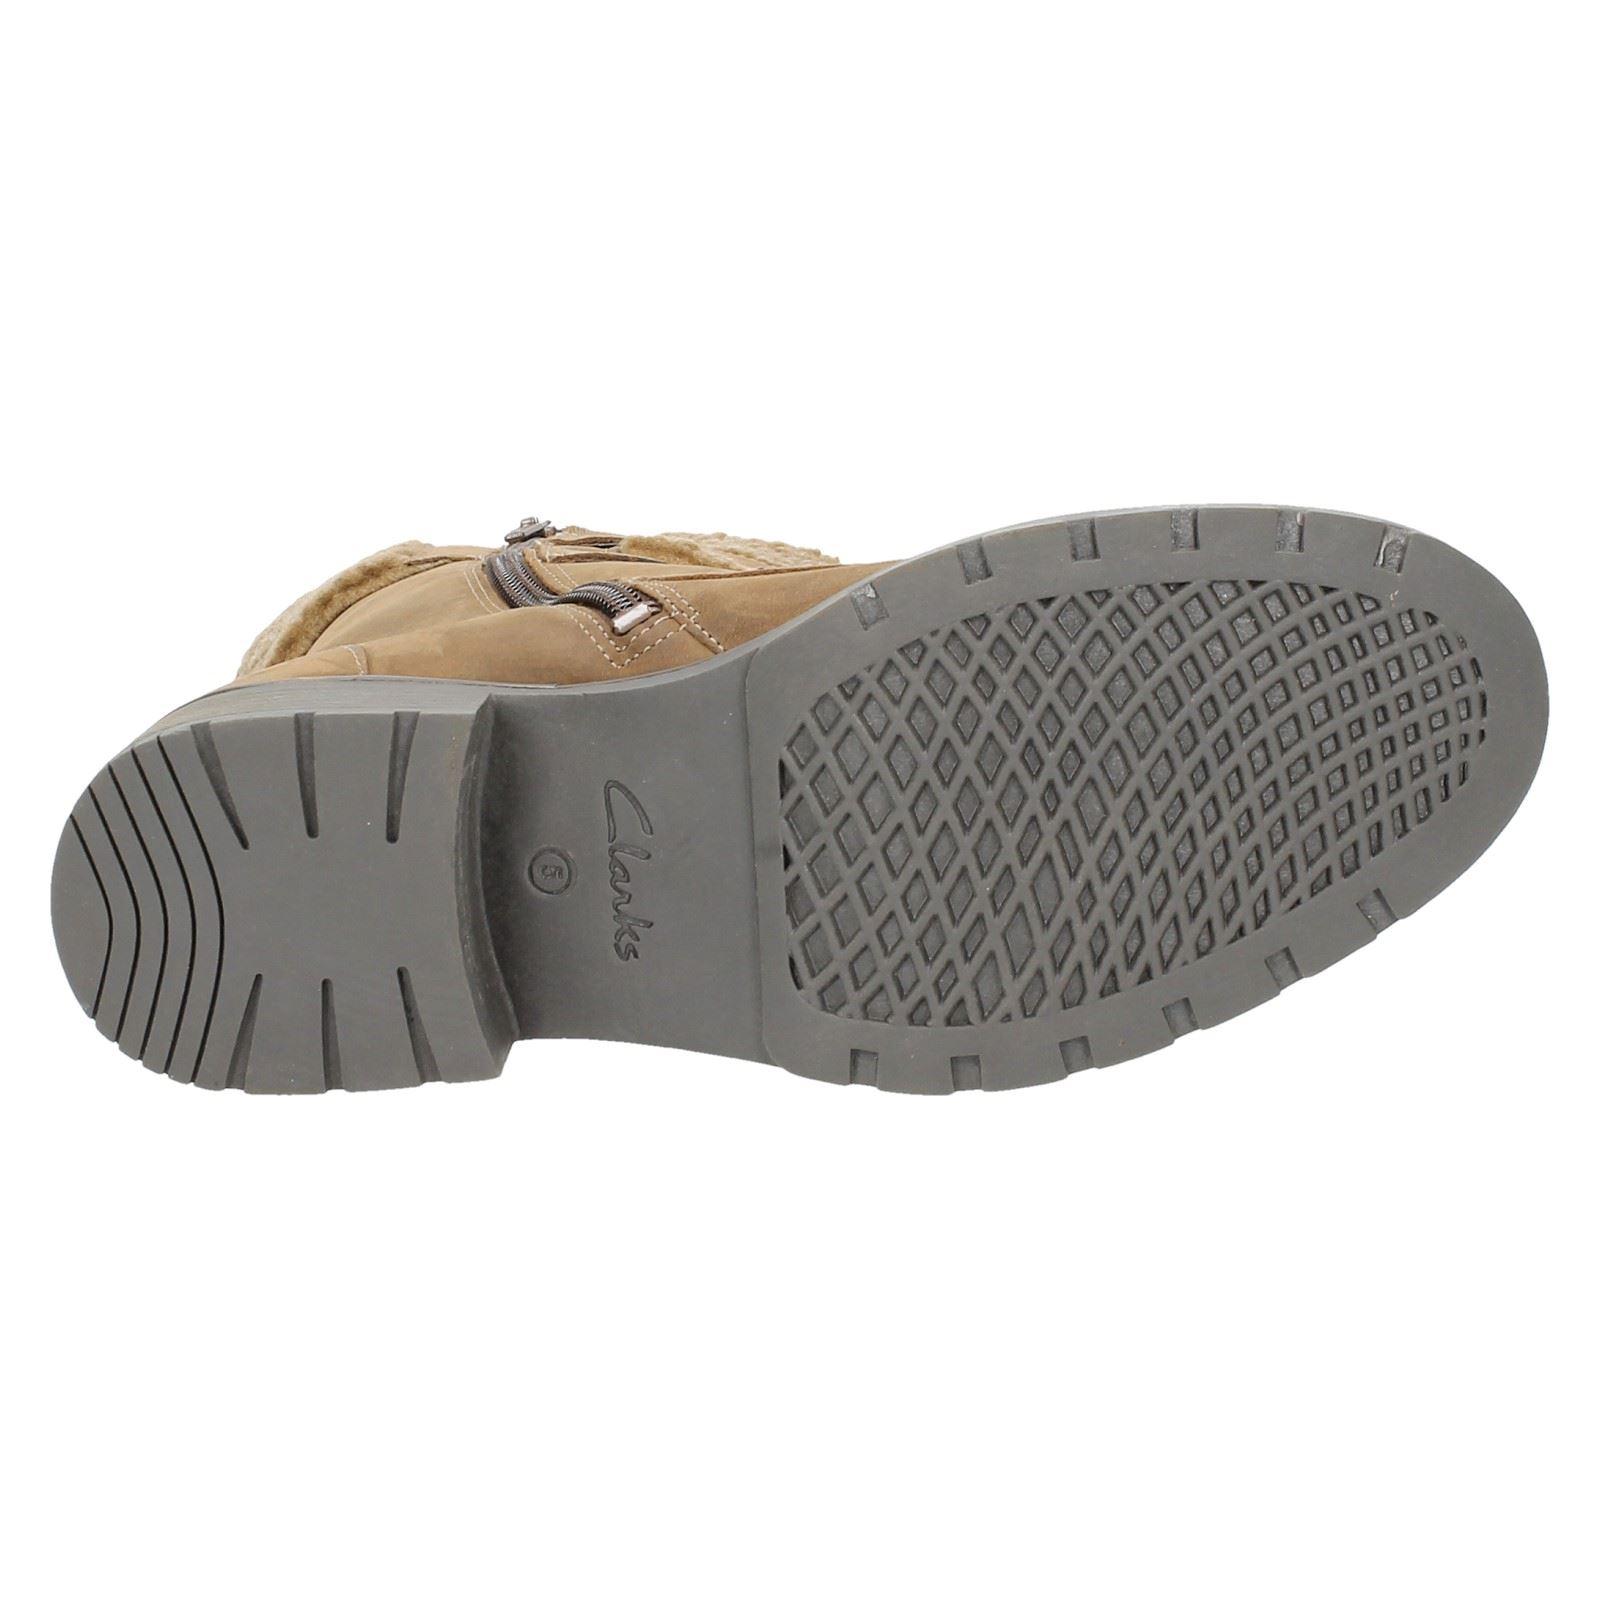 orinoco Prix Clarks femme brun Casual pour Boots 'Claracco' fBwZxqTBF